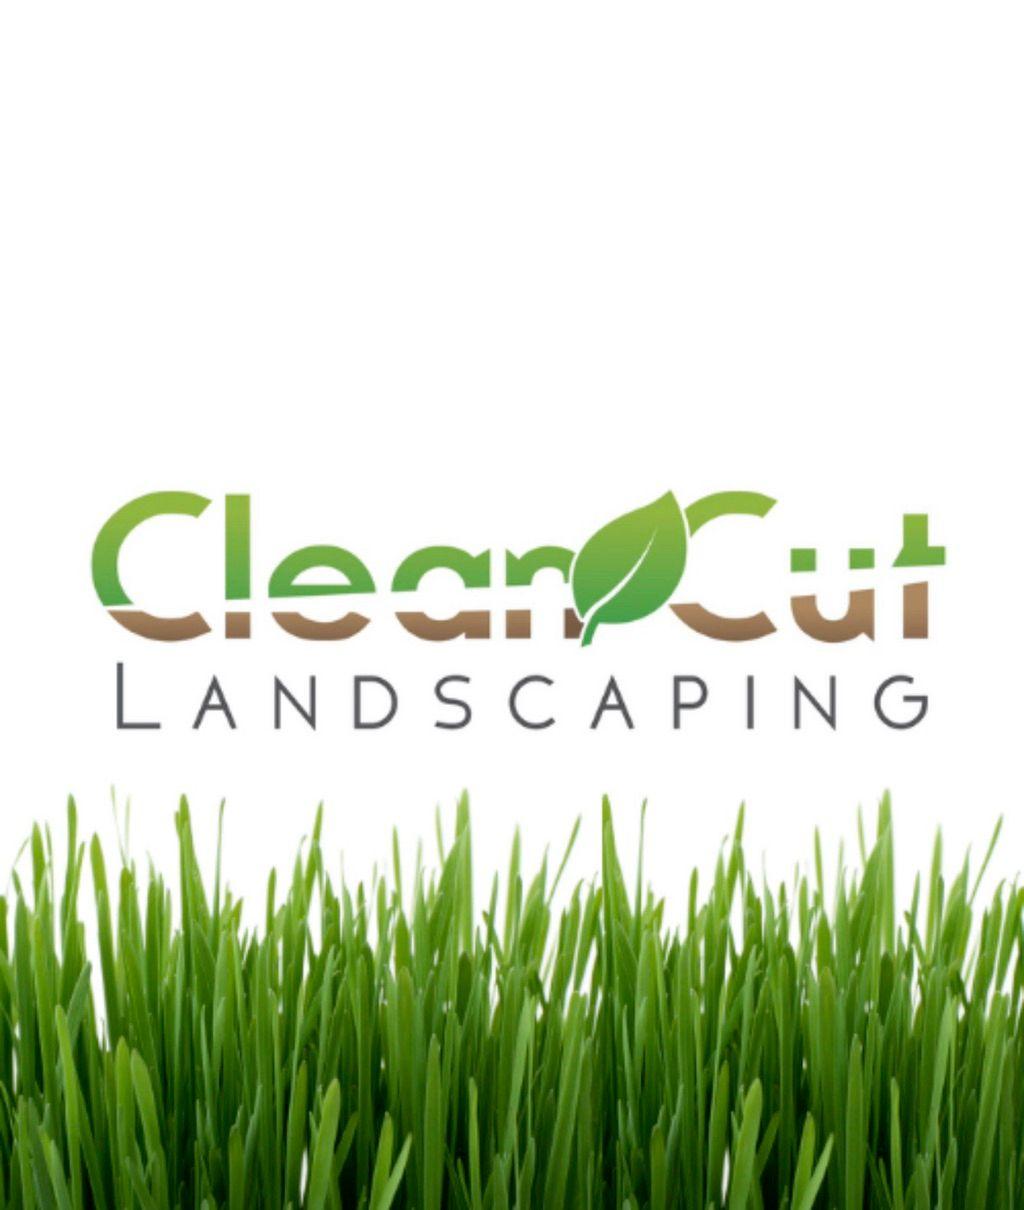 Clean Cut Landscaping